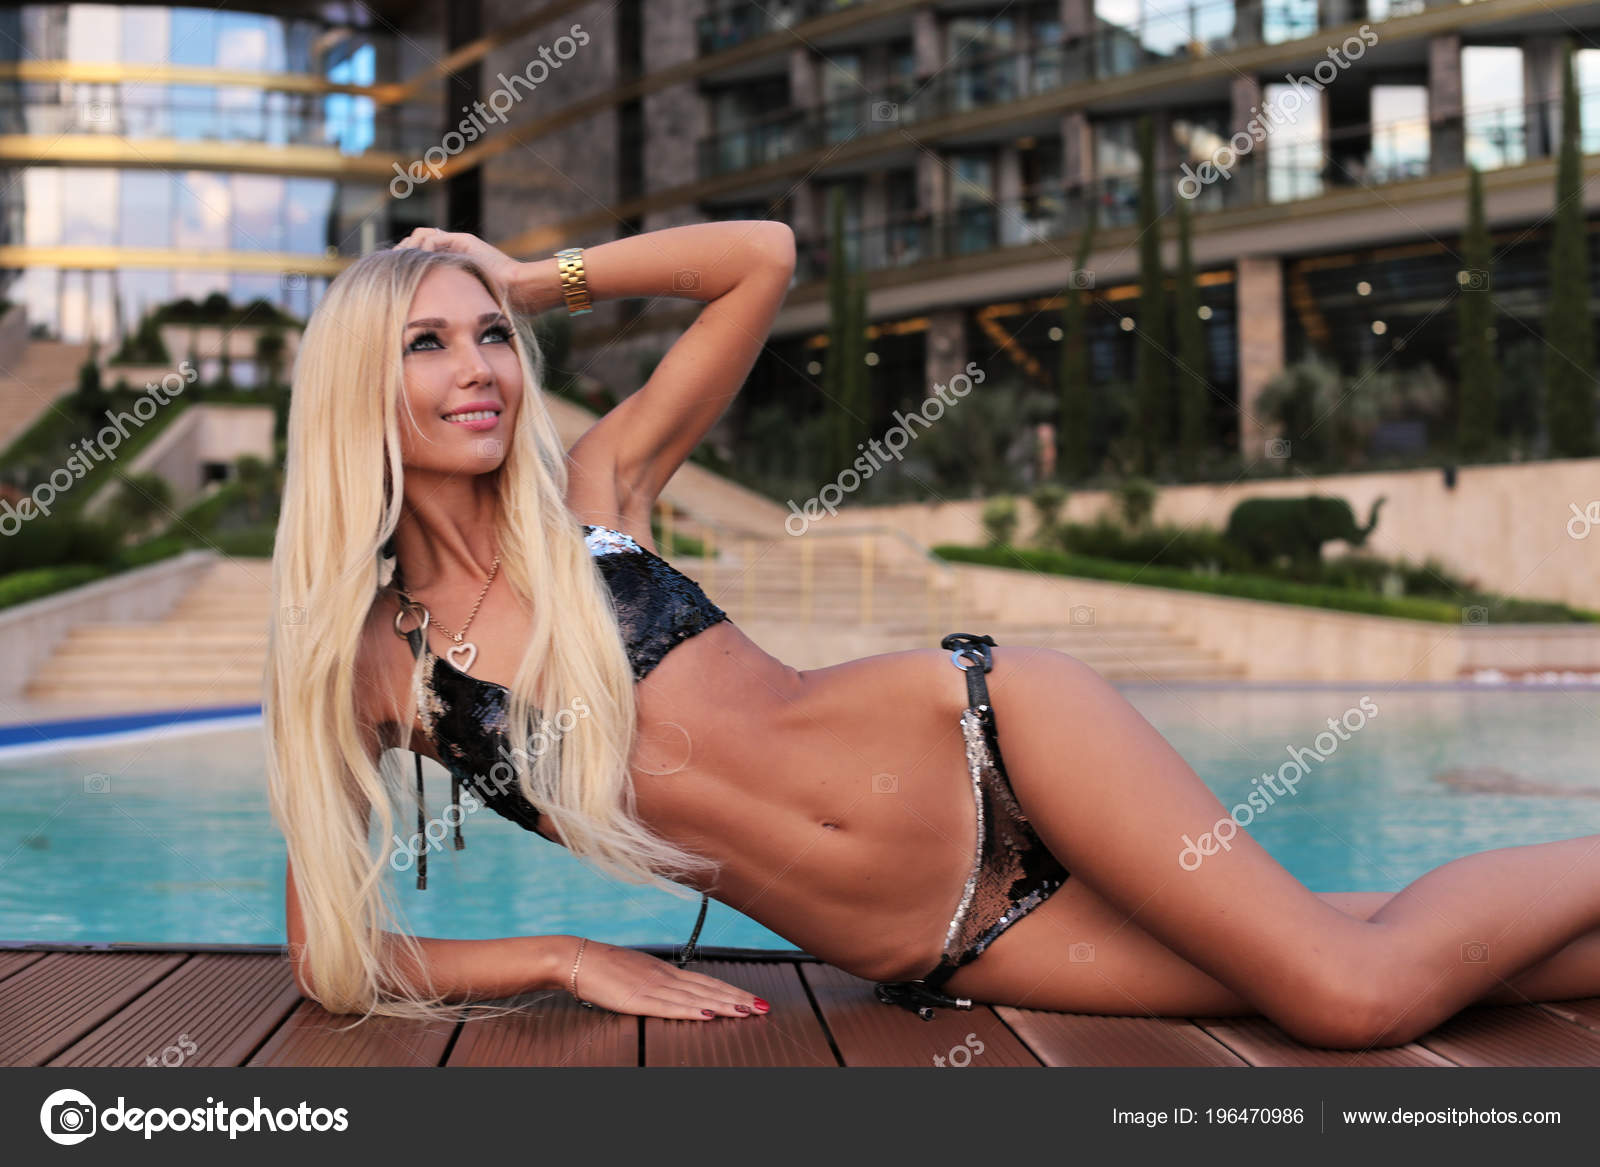 79b9934b5dd Μόδα Καλοκαιρινή Φωτογραφία Του Όμορφη Σέξι Γυναίκα Ξανθά Μαλλιά ...